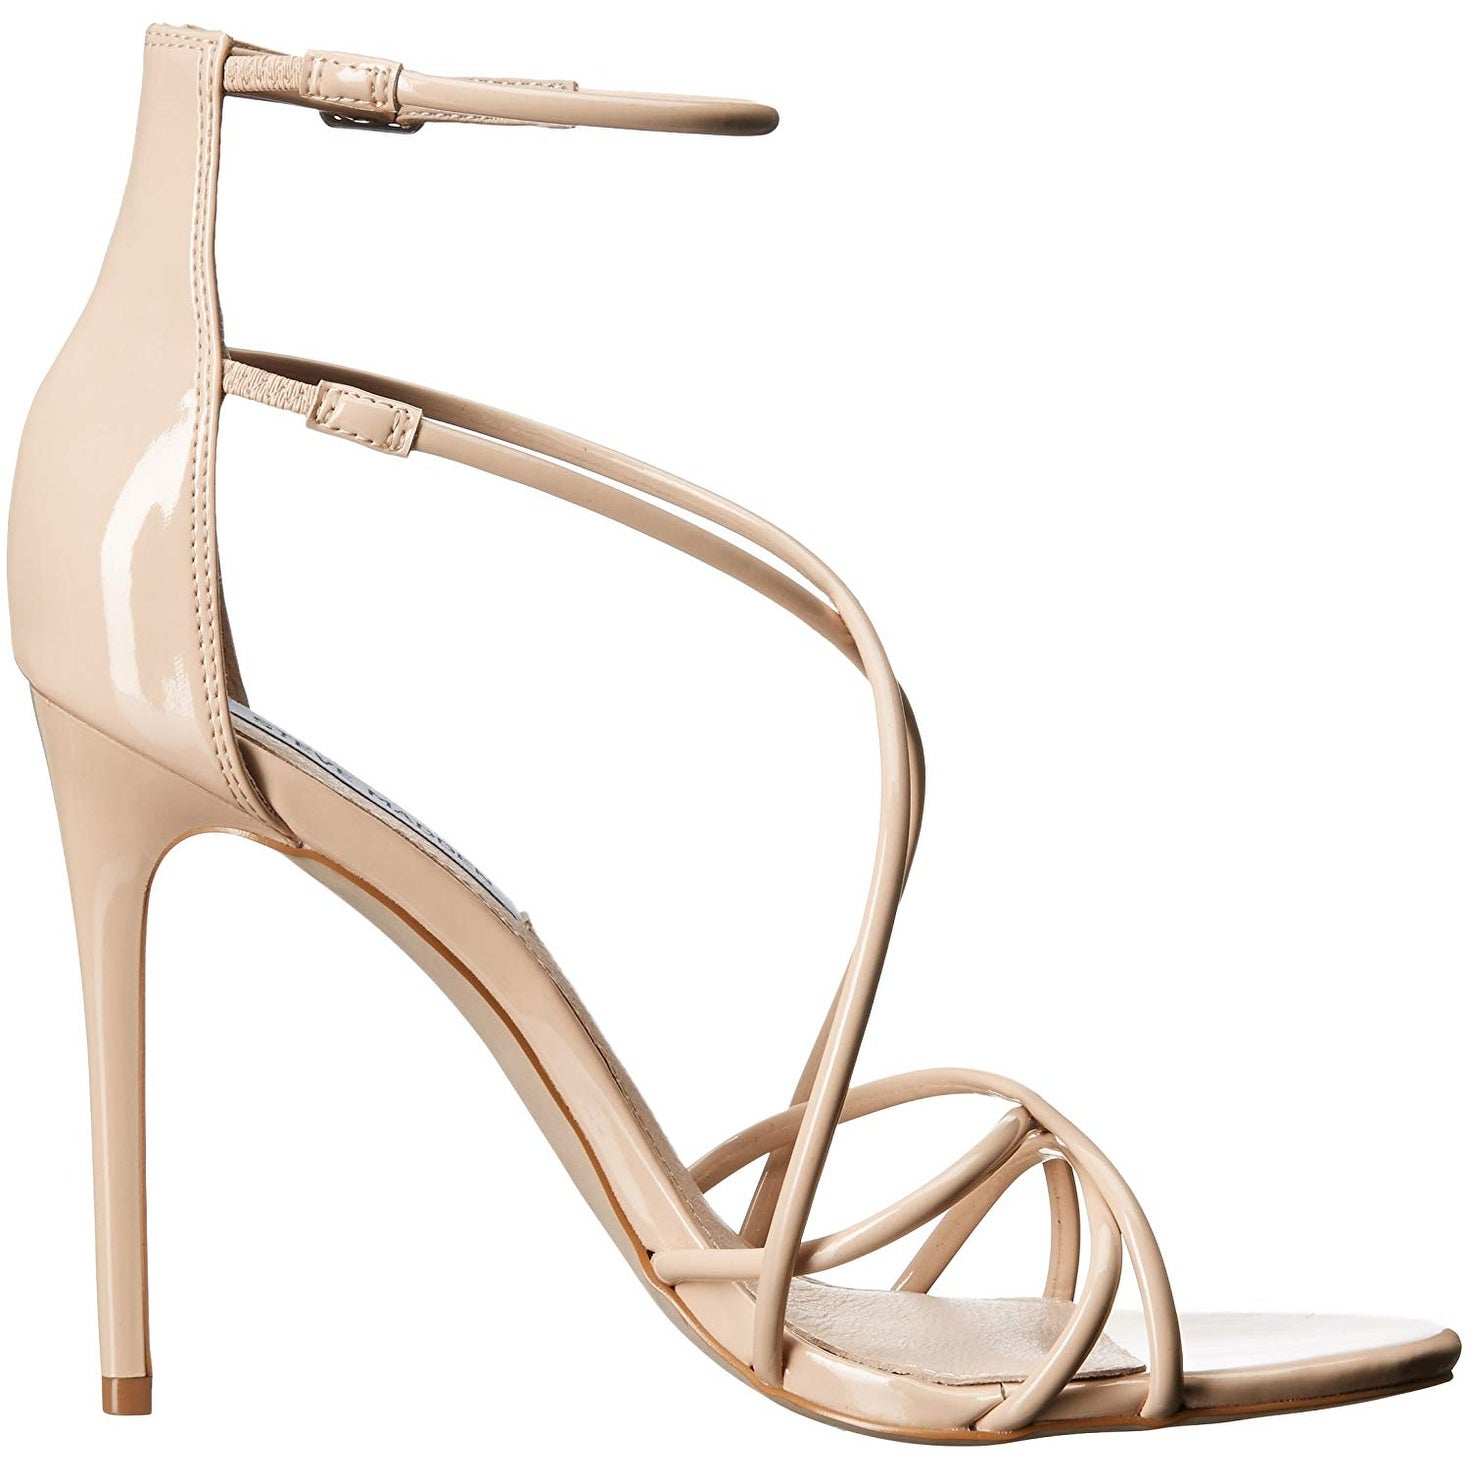 b95b1f3d2b6 Shop Steve Madden Women s Satire Dress Sandal - Free Shipping Today -  Overstock - 26029952